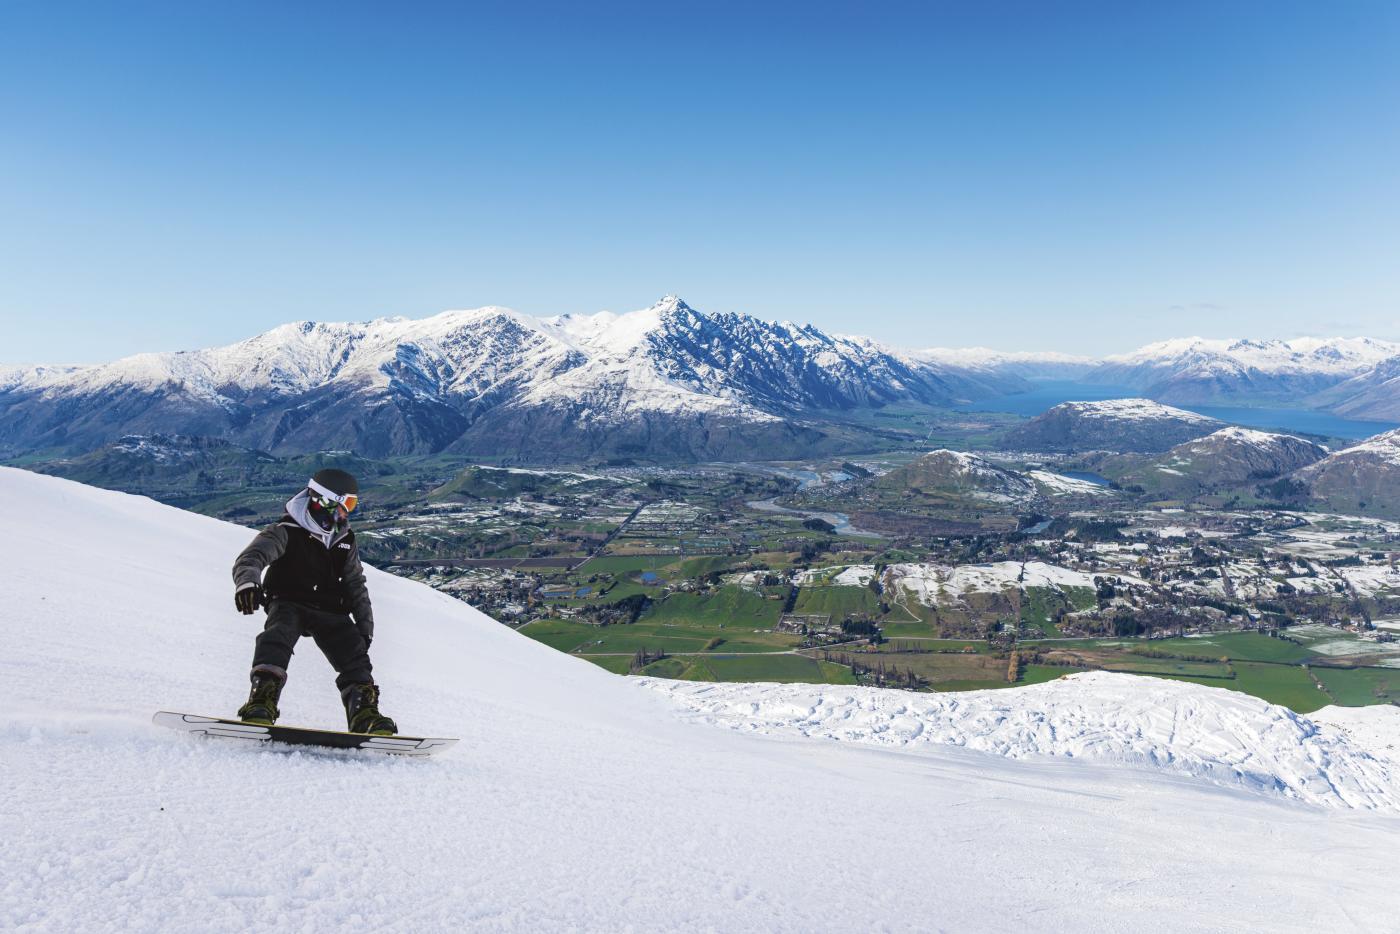 Coronet Peak Snowboarder on a bluebird day